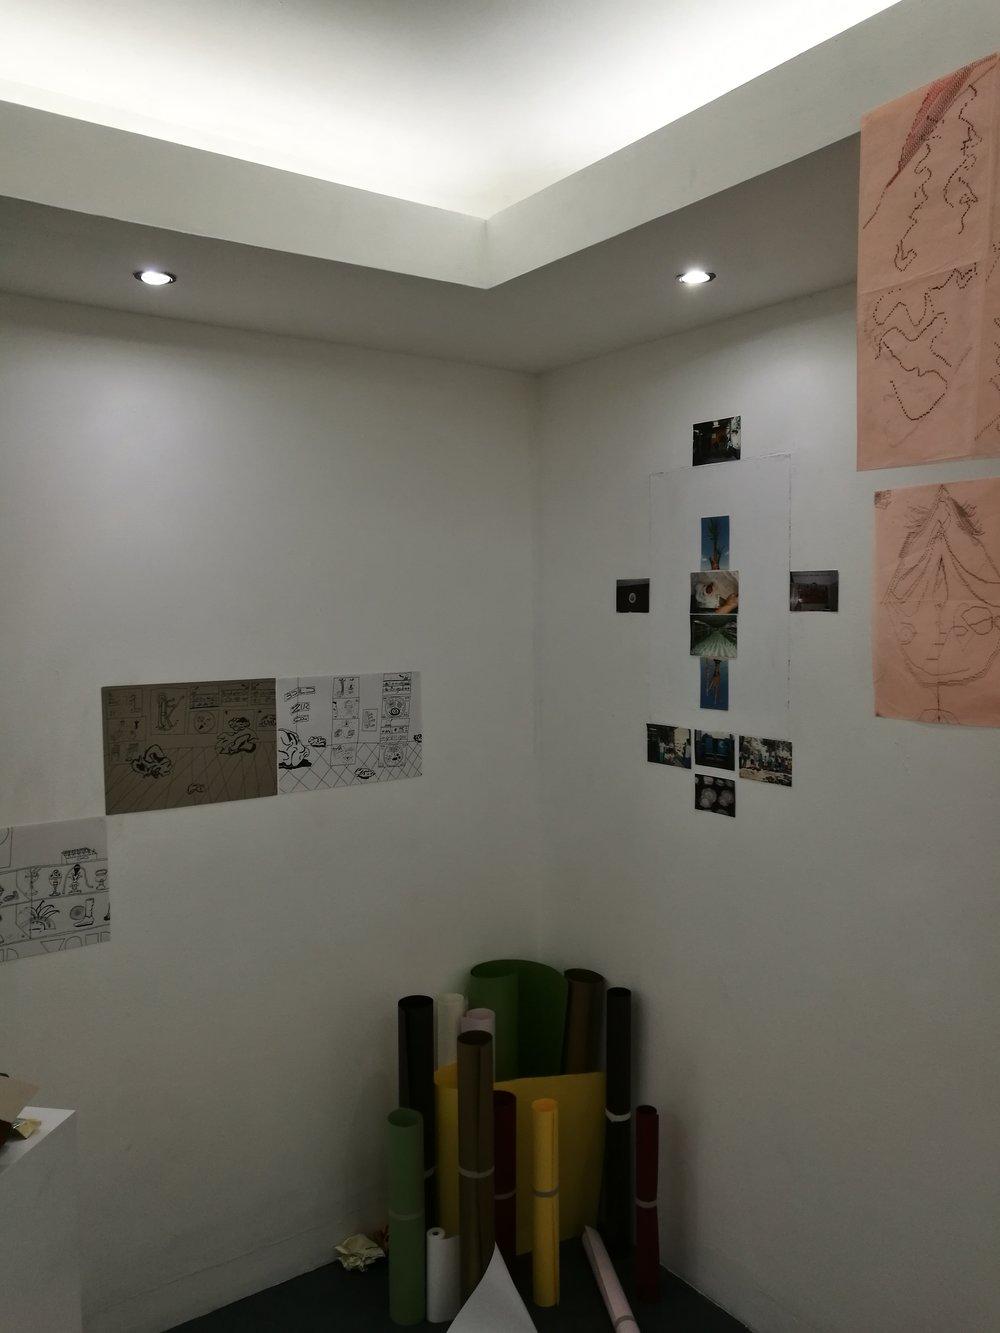 camila fernandez - project room 56.jpg